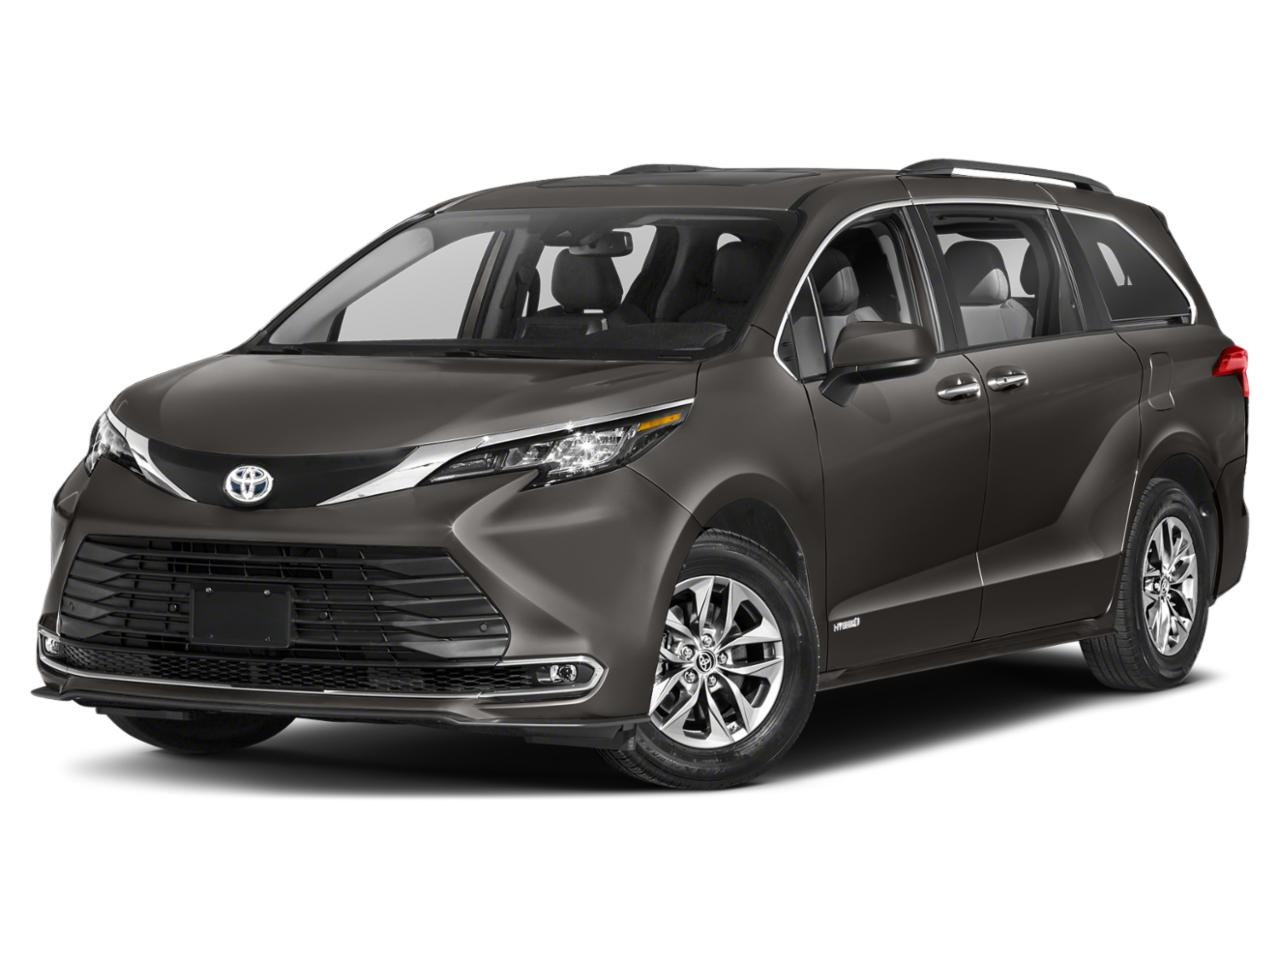 2021 Toyota Sienna Vehicle Photo in Oshkosh, WI 54904